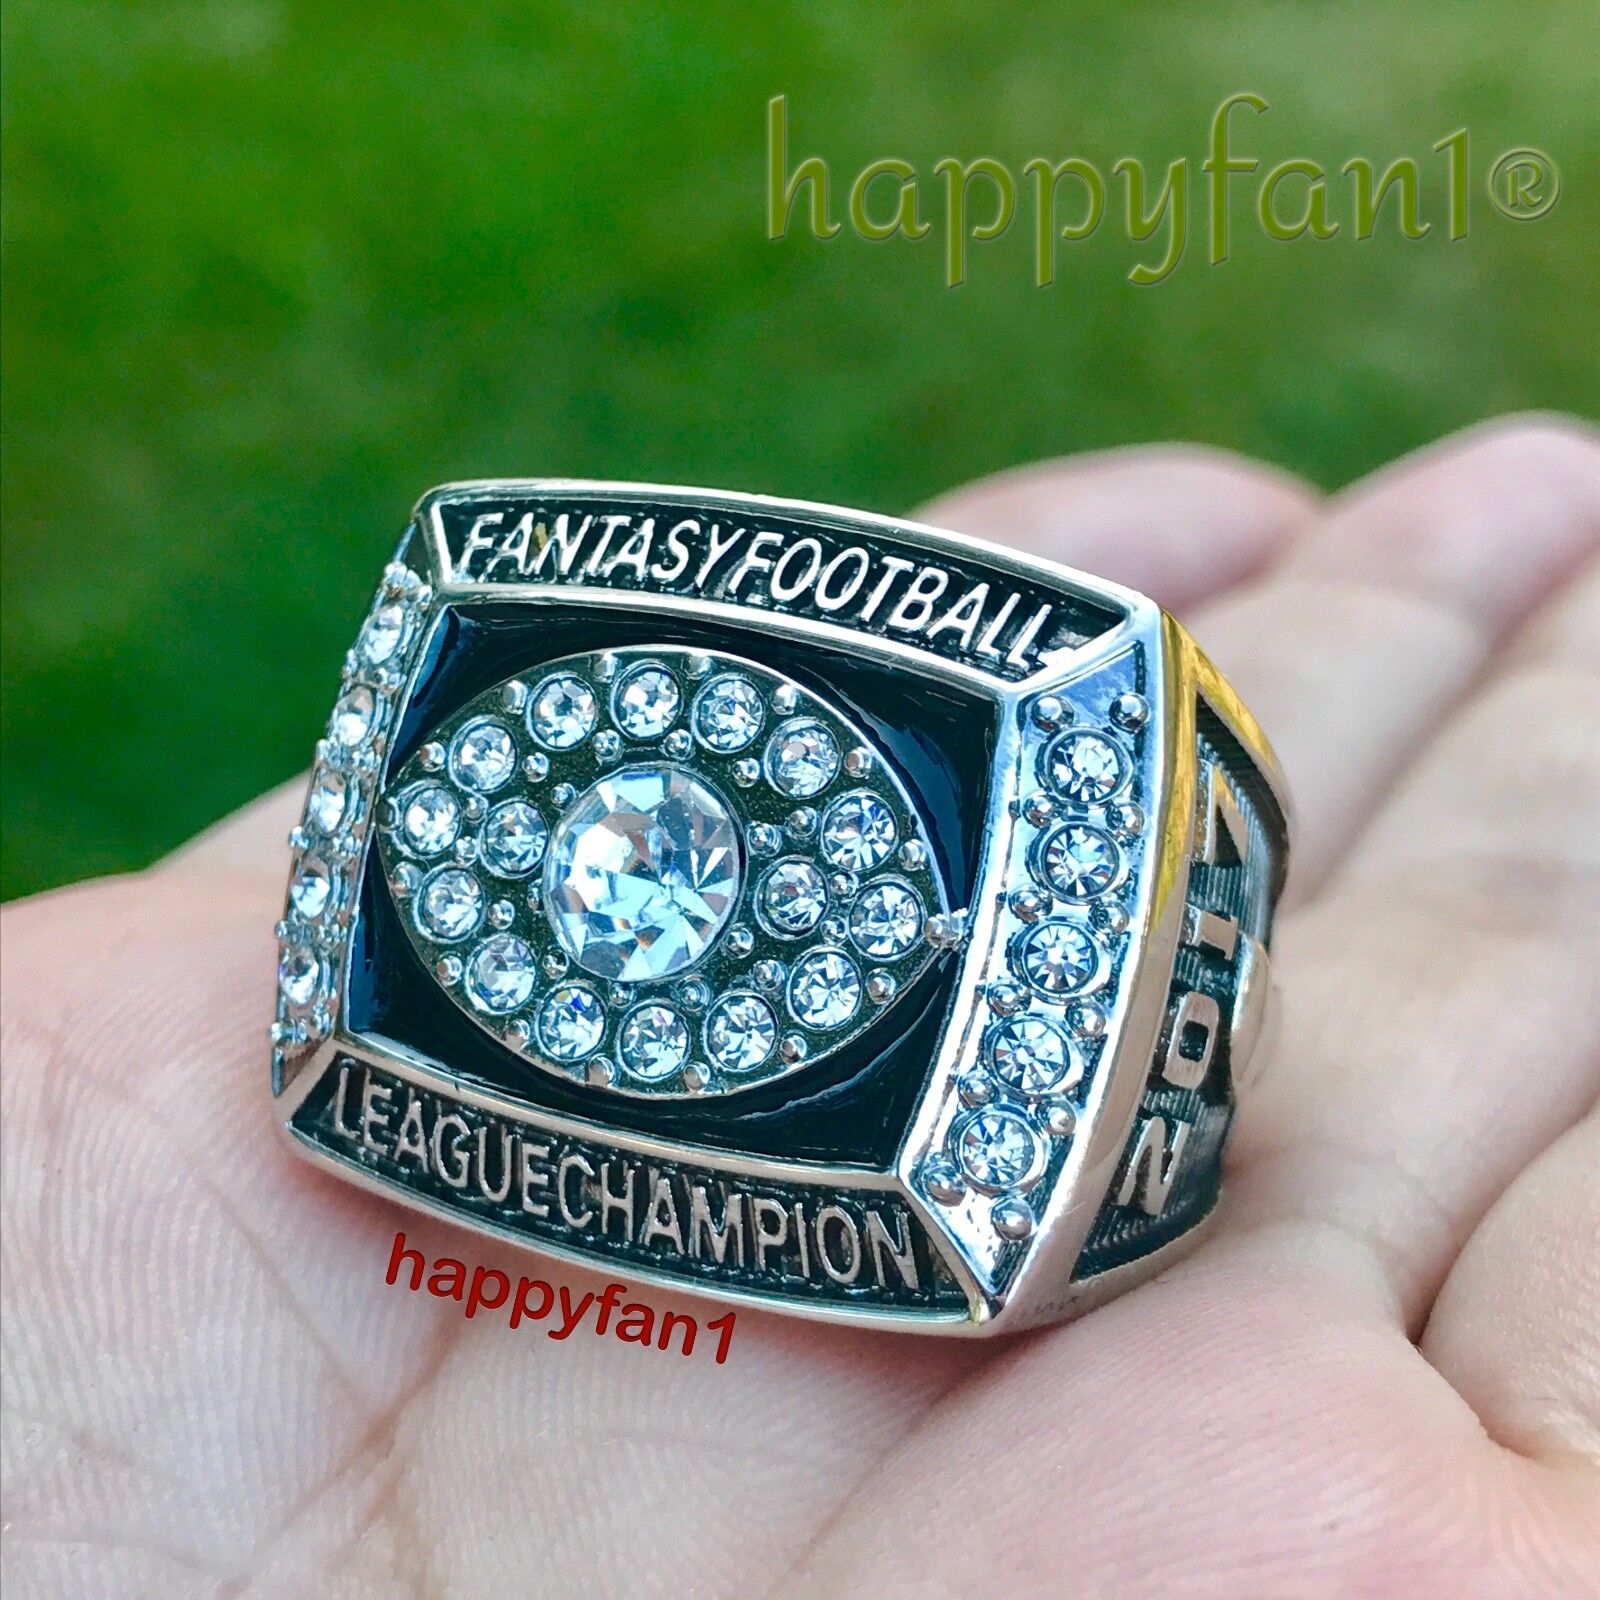 2017 Fantasy Football Championship Ring Season League Trophy size 8-14 New